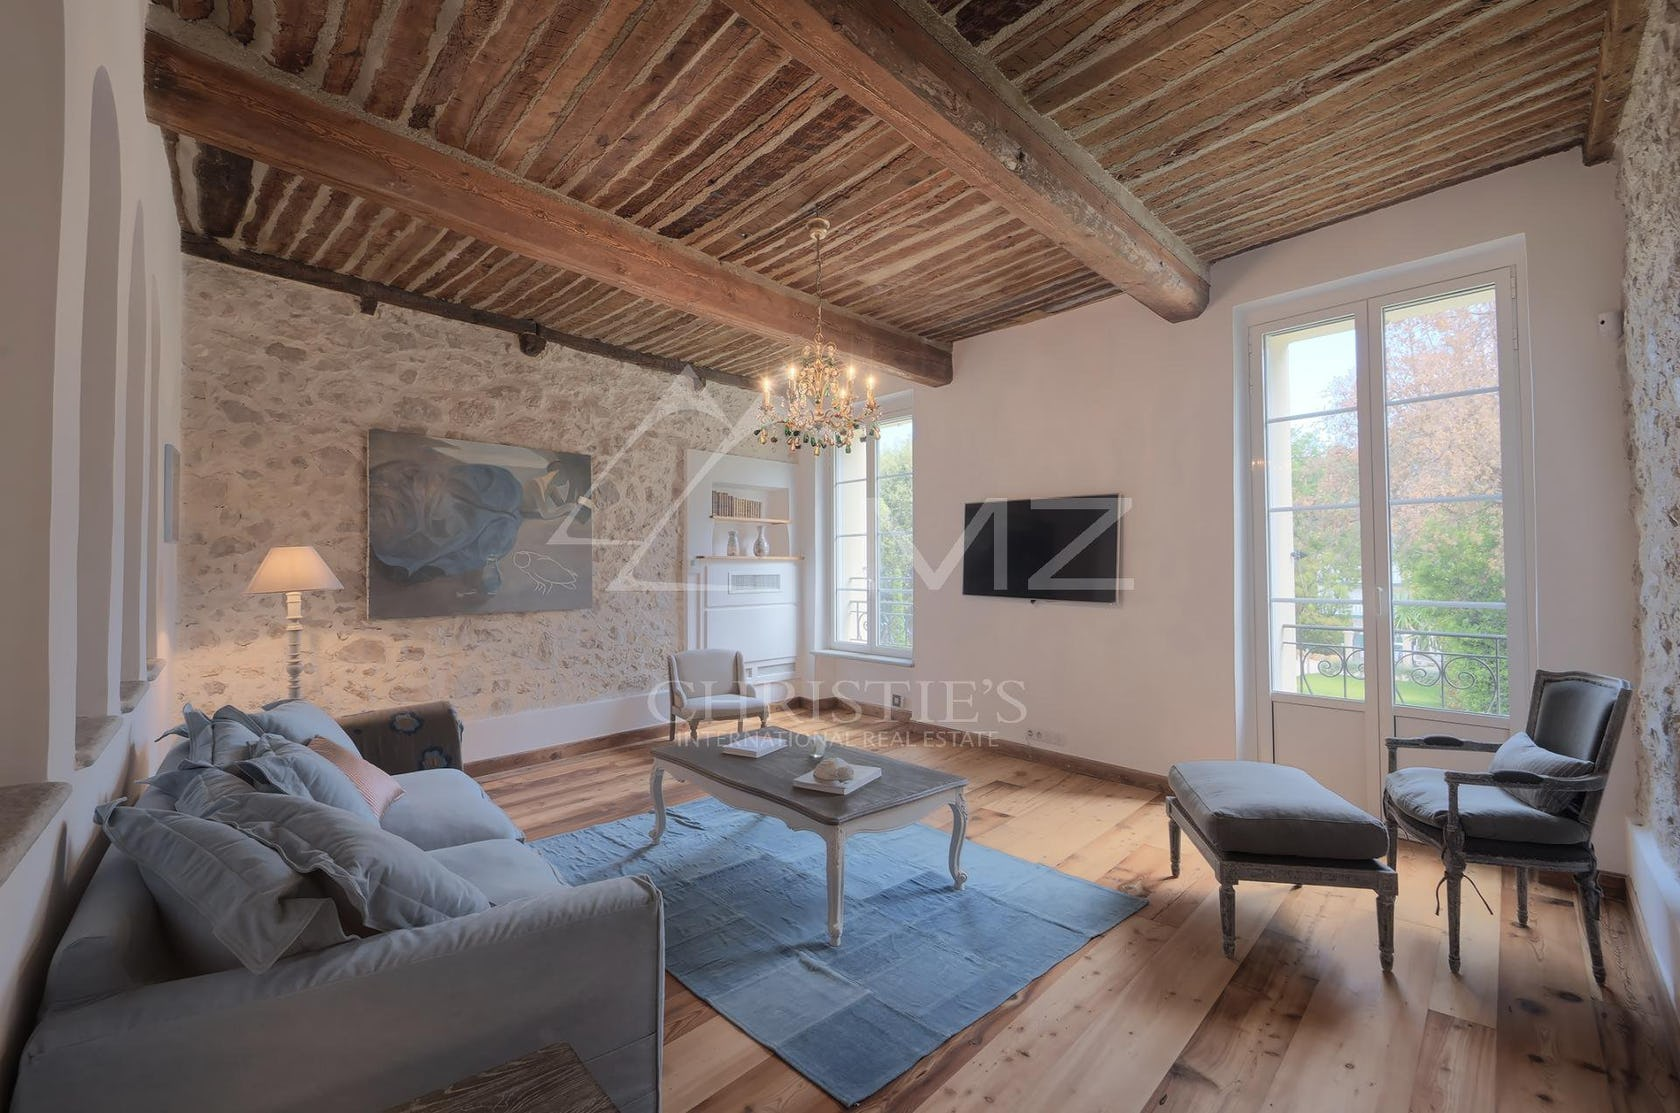 flooring housing building living room indoors wood furniture loft hardwood interior design